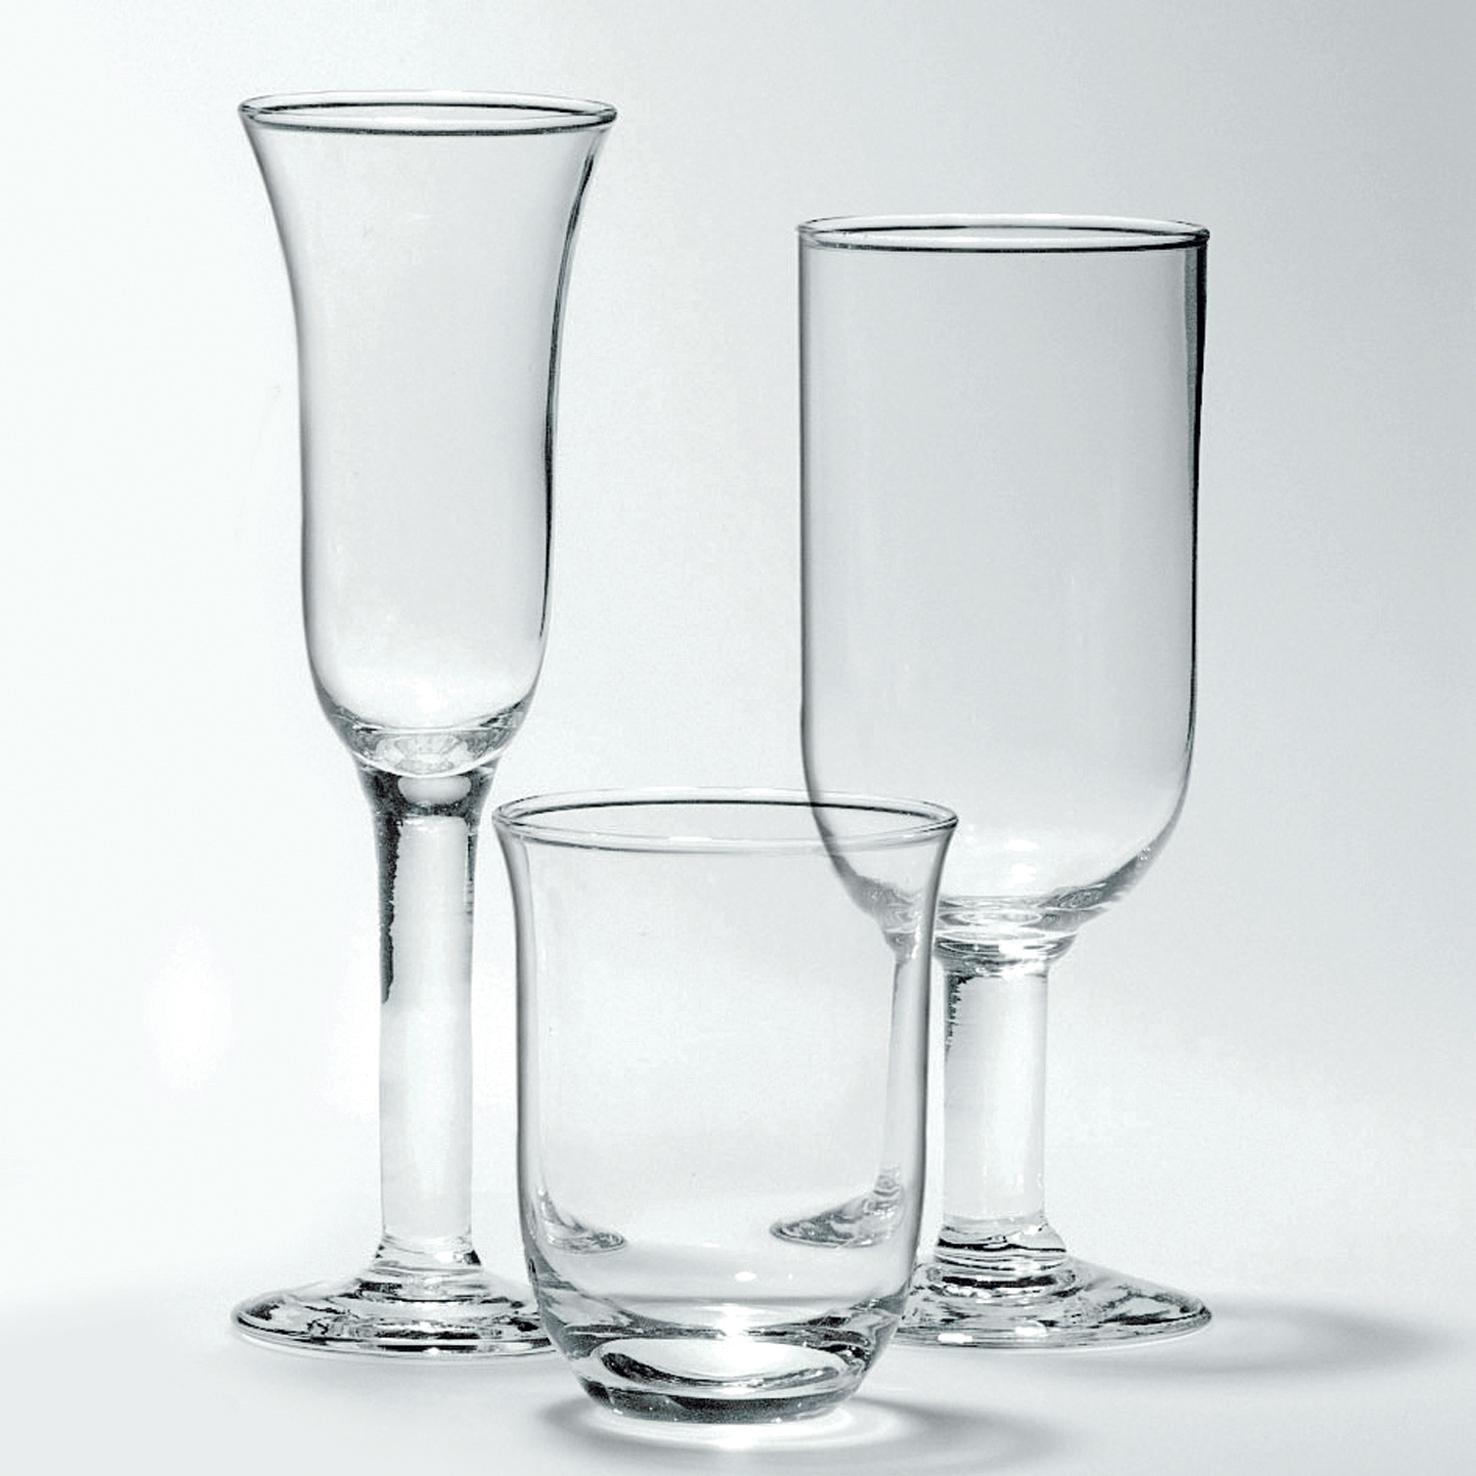 Lambert Corsica Grünglas Bistroglas, verschiedene Ausführungen